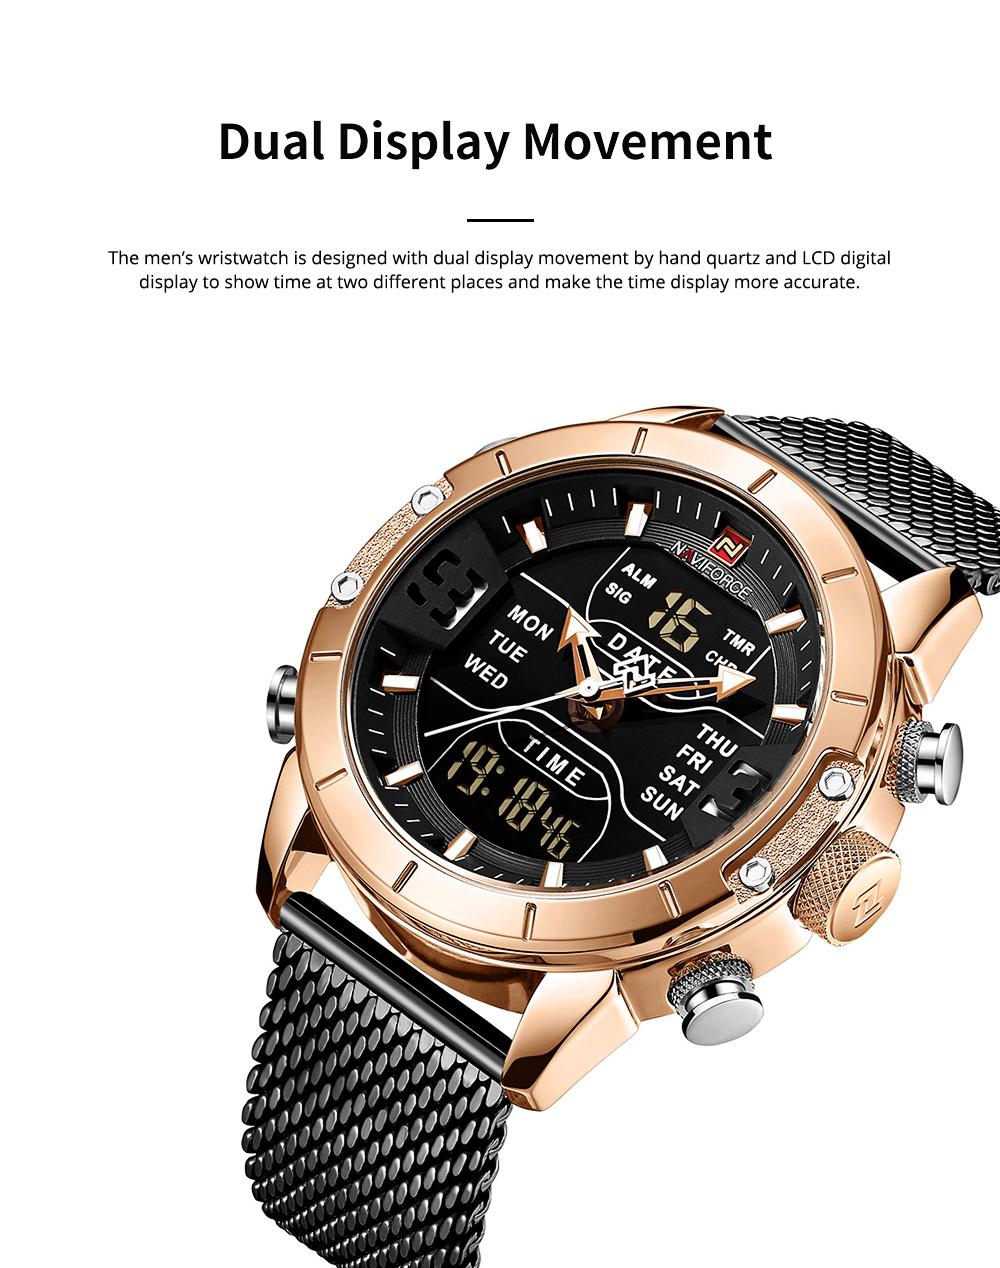 Fashionable Casual Men's Wristwatch with Stainless-steel Bracelet Waterproof Dual Display Movement Luminous Hand Quartz Sport Watch 1